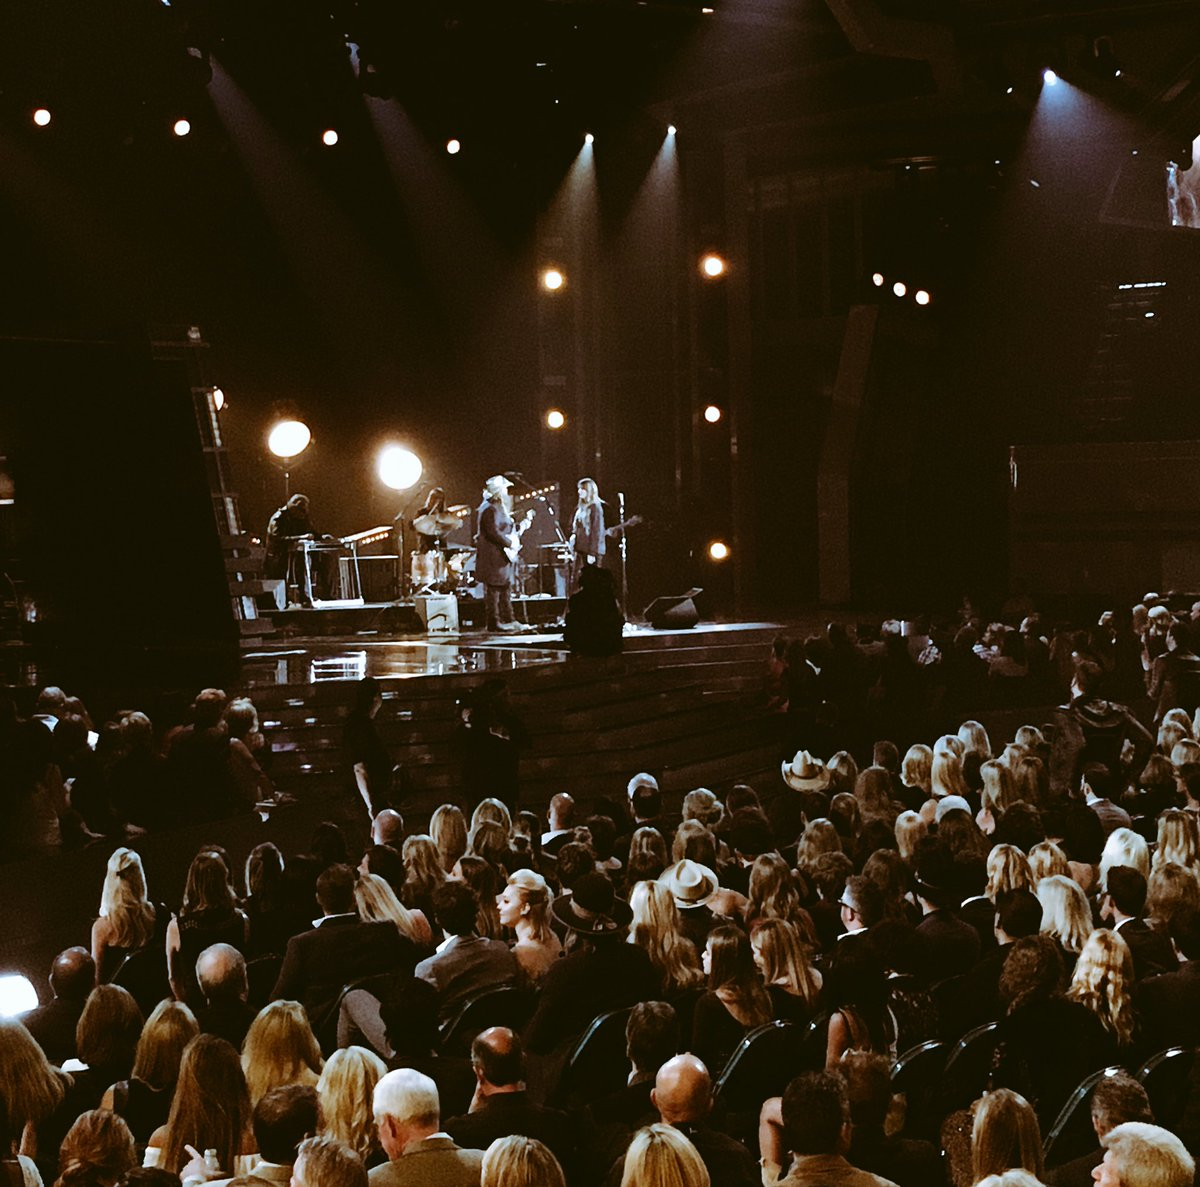 Well-deserved #MaleVocalistOfTheYear win! We  @ChrisStapleton!!! #ACMs<br>http://pic.twitter.com/pjGnmW9DF4